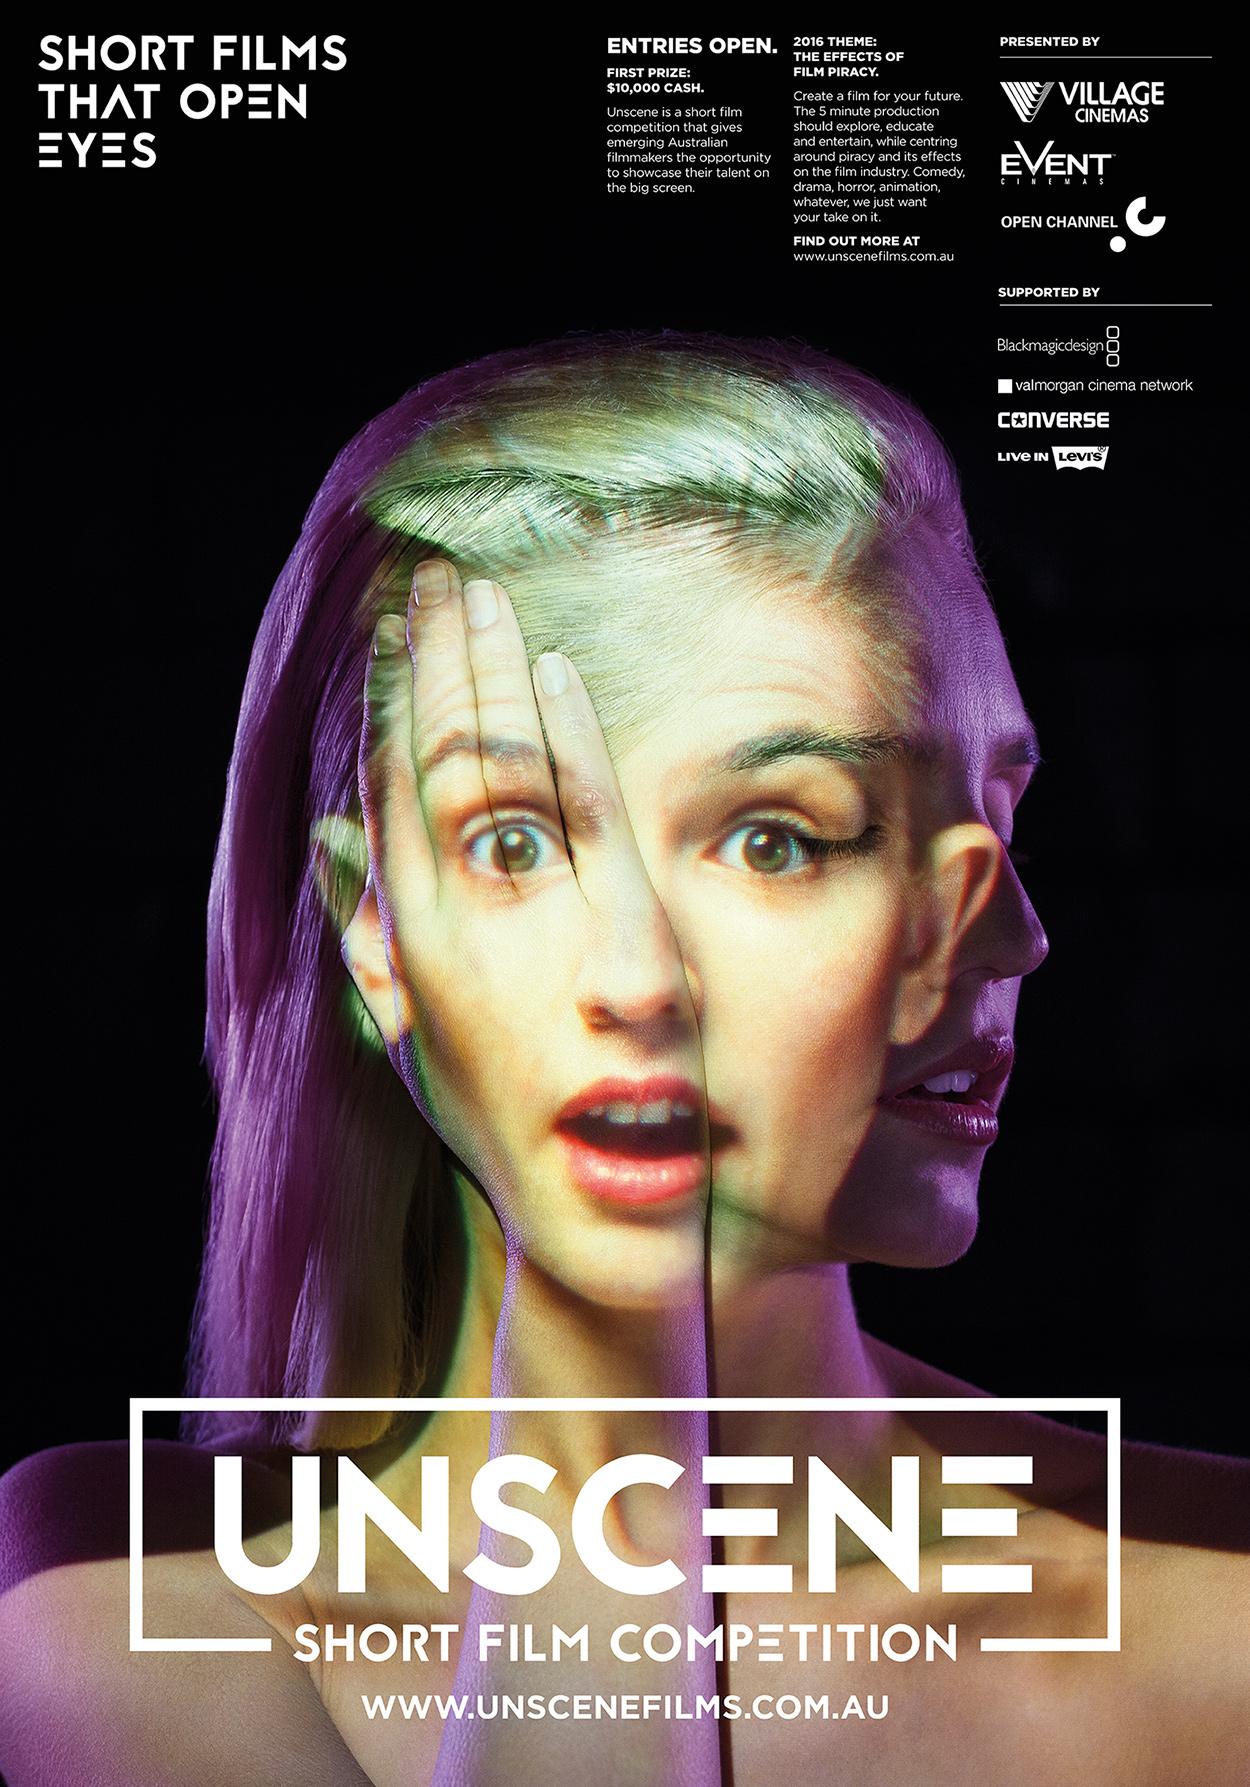 UNSCENE for Village Cinema